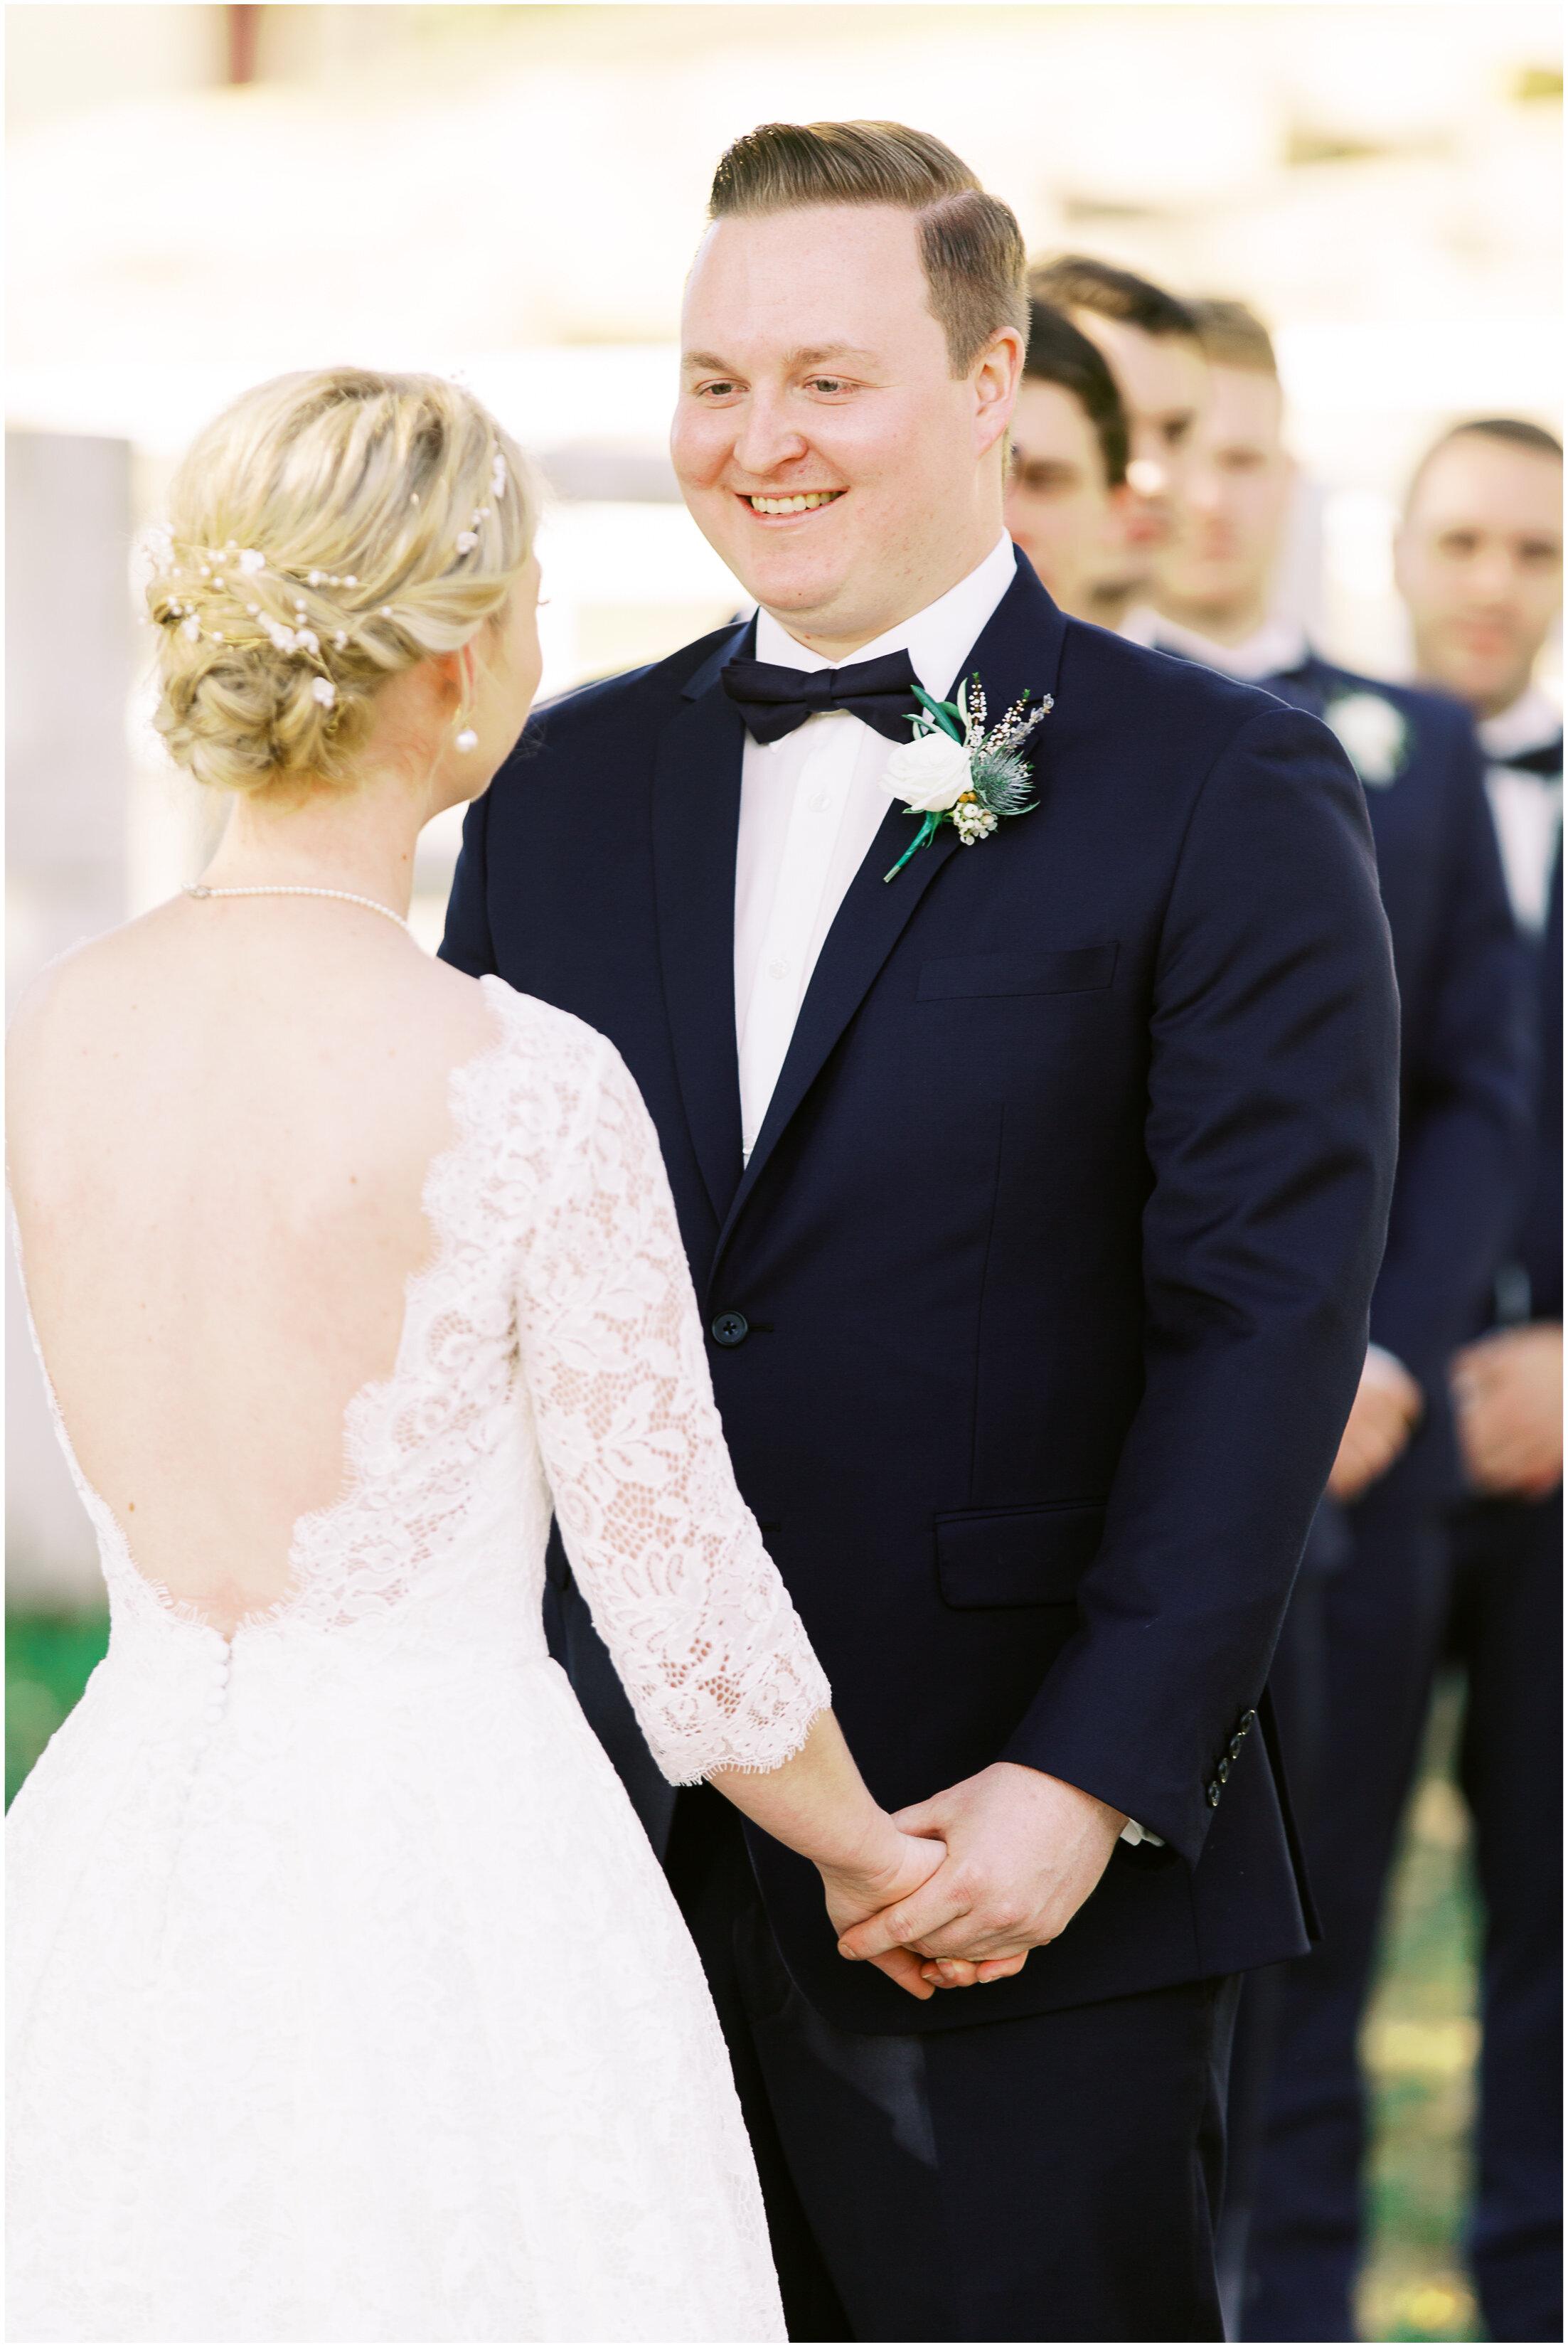 brisbane-fine-art-wedding-photographer-lauren-olivia-luxury-wedding-australia-10.jpg